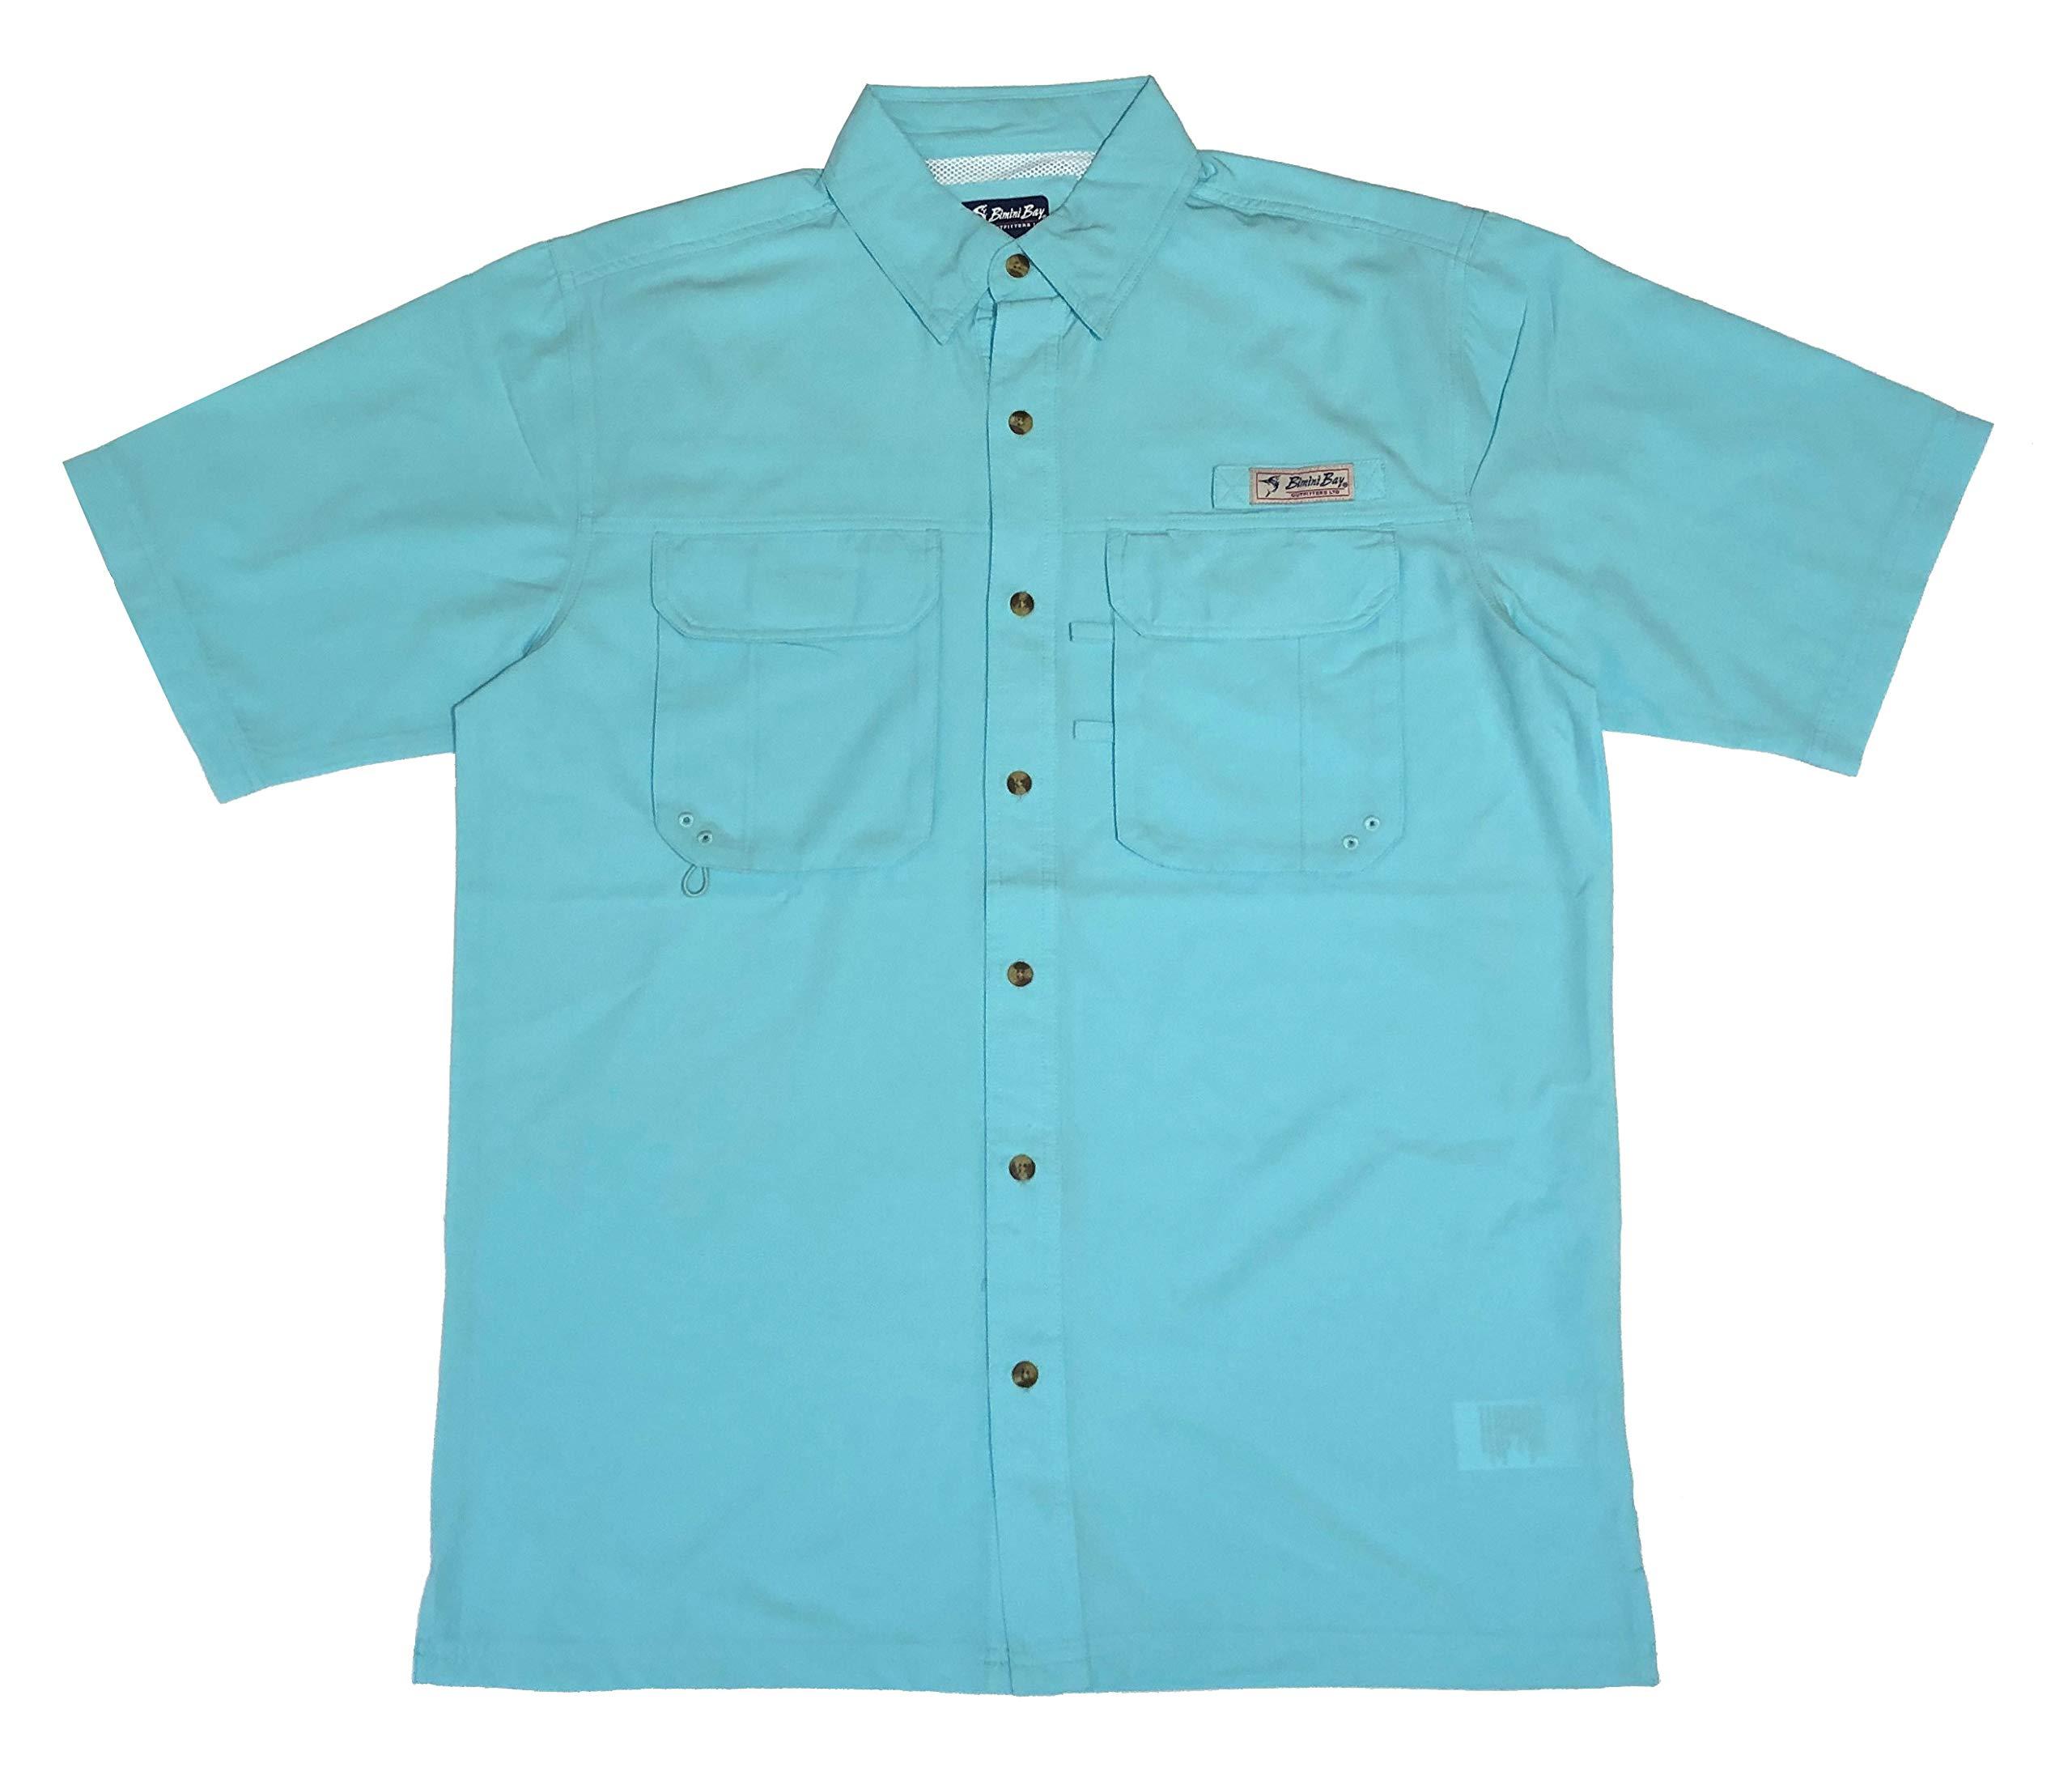 Bimini Bay Outfitters Men's Bimini Flats IV with BloodGuard Quick Dri Short Sleeve Shirt (2-Pack) (Aqua, X-Large) by Bimini Bay Outfitters